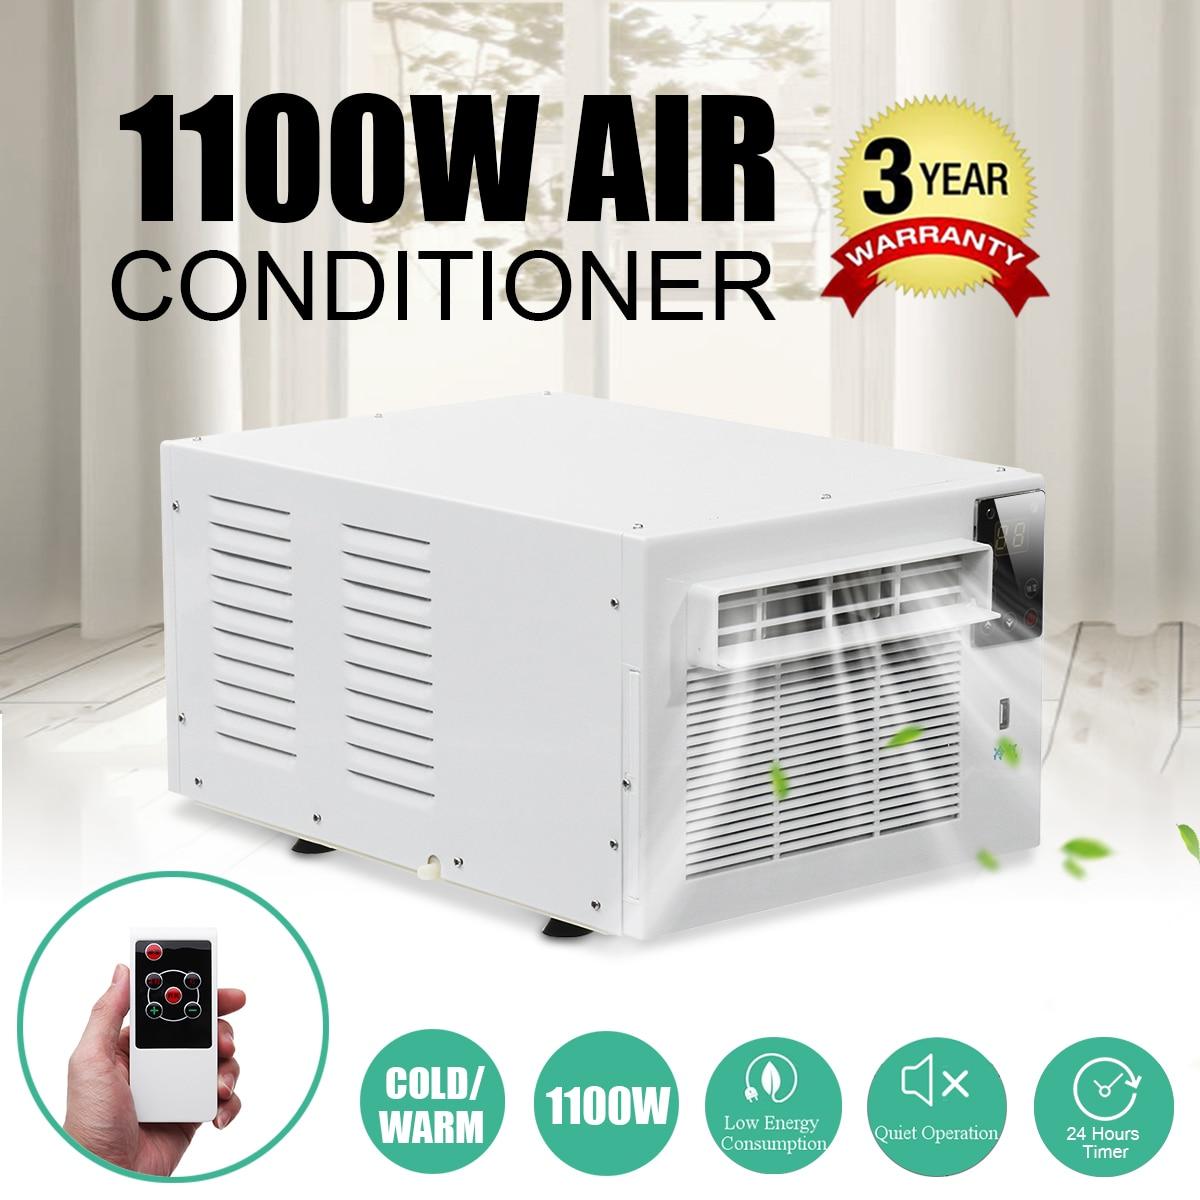 1100W aire acondicionado de escritorio 220V/AC 24 horas temporizador frío/calor doble uso con control remoto LED panel de control de aire para mascotas